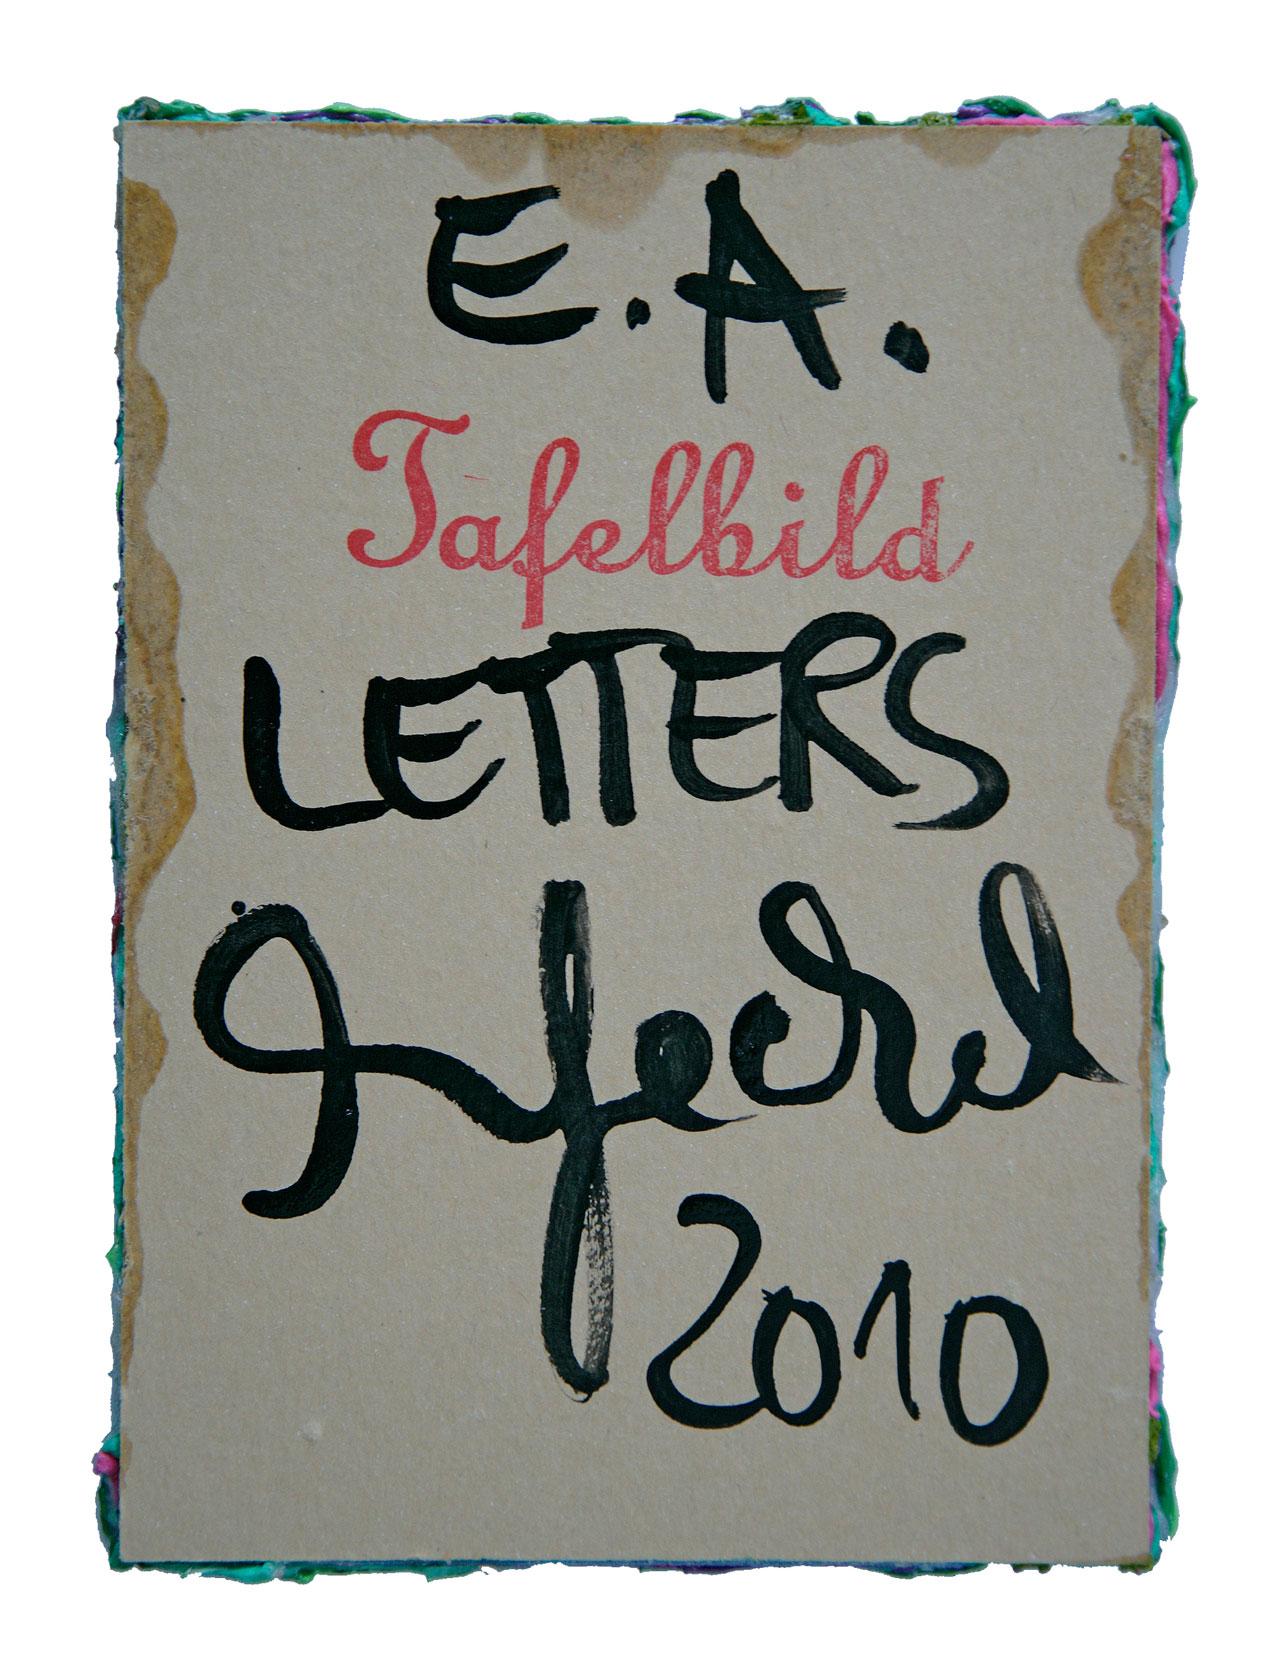 back | LETTERS | 2010 © Kerstin Jeckel | TAFELBILD #91